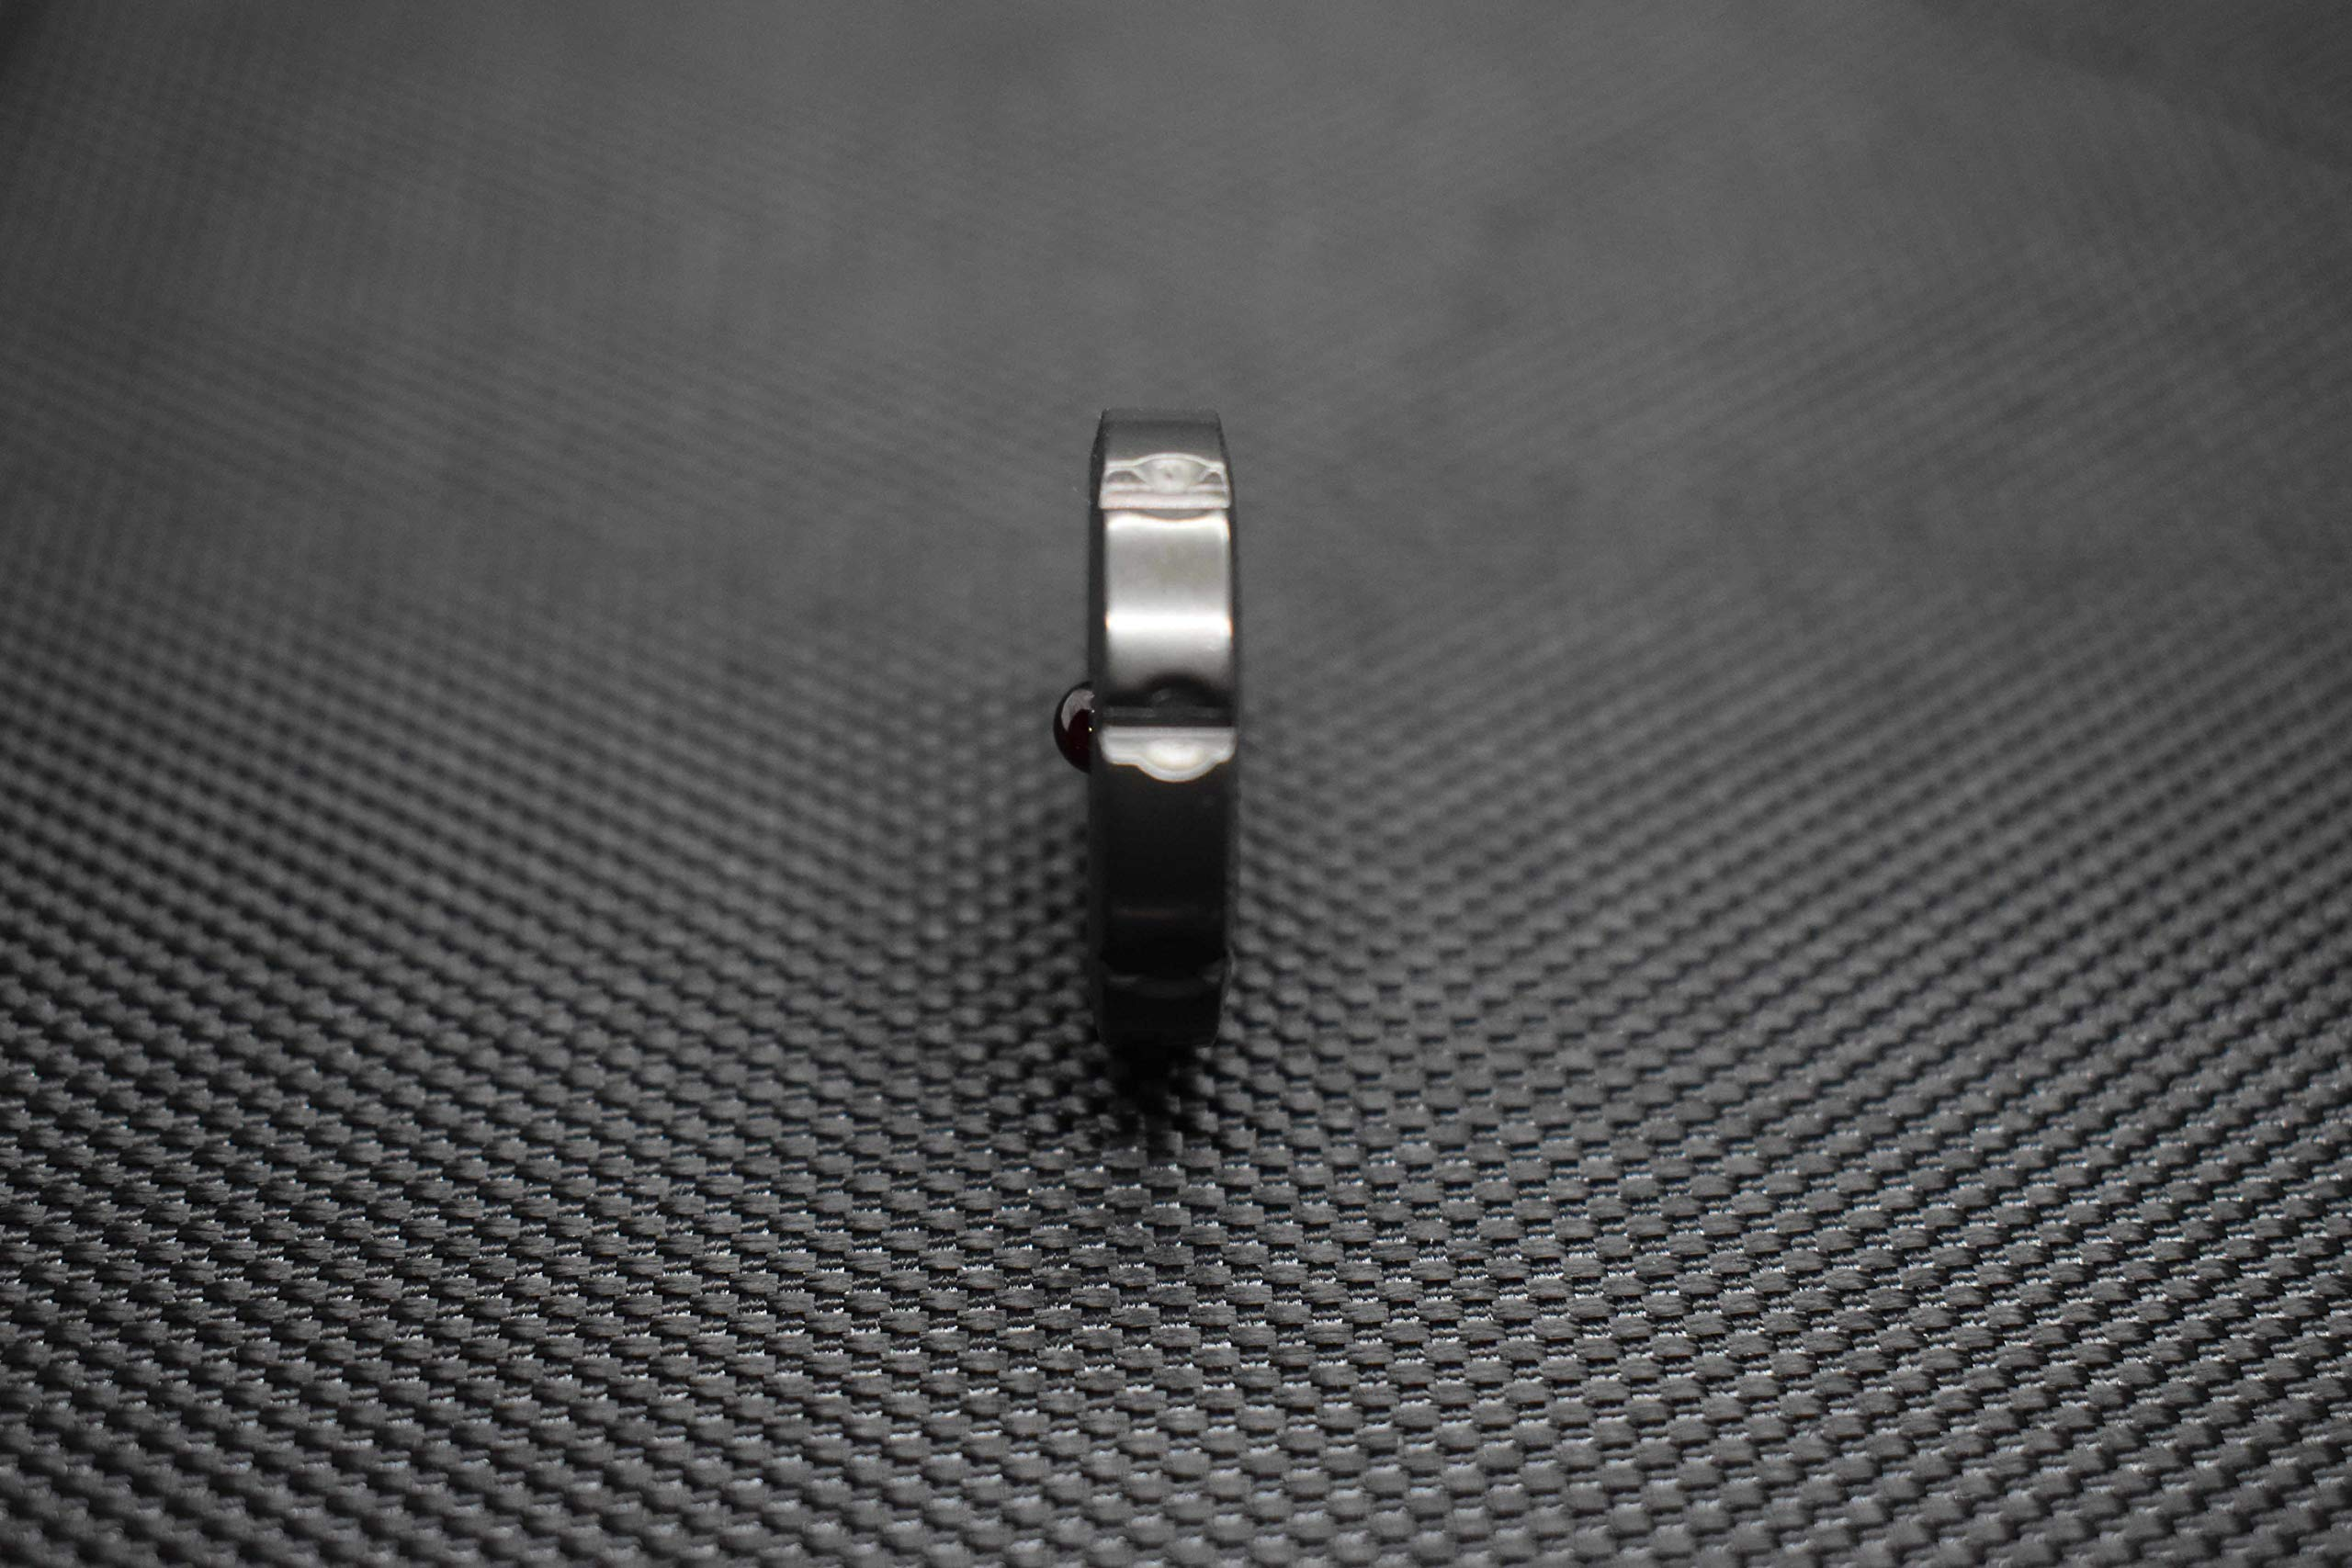 MetonBoss Worry Coin Black Zirconium & Ruby Bearing   Everyday Carry Gear   Precision-Made and Desktop Display by MetonBoss (Image #7)